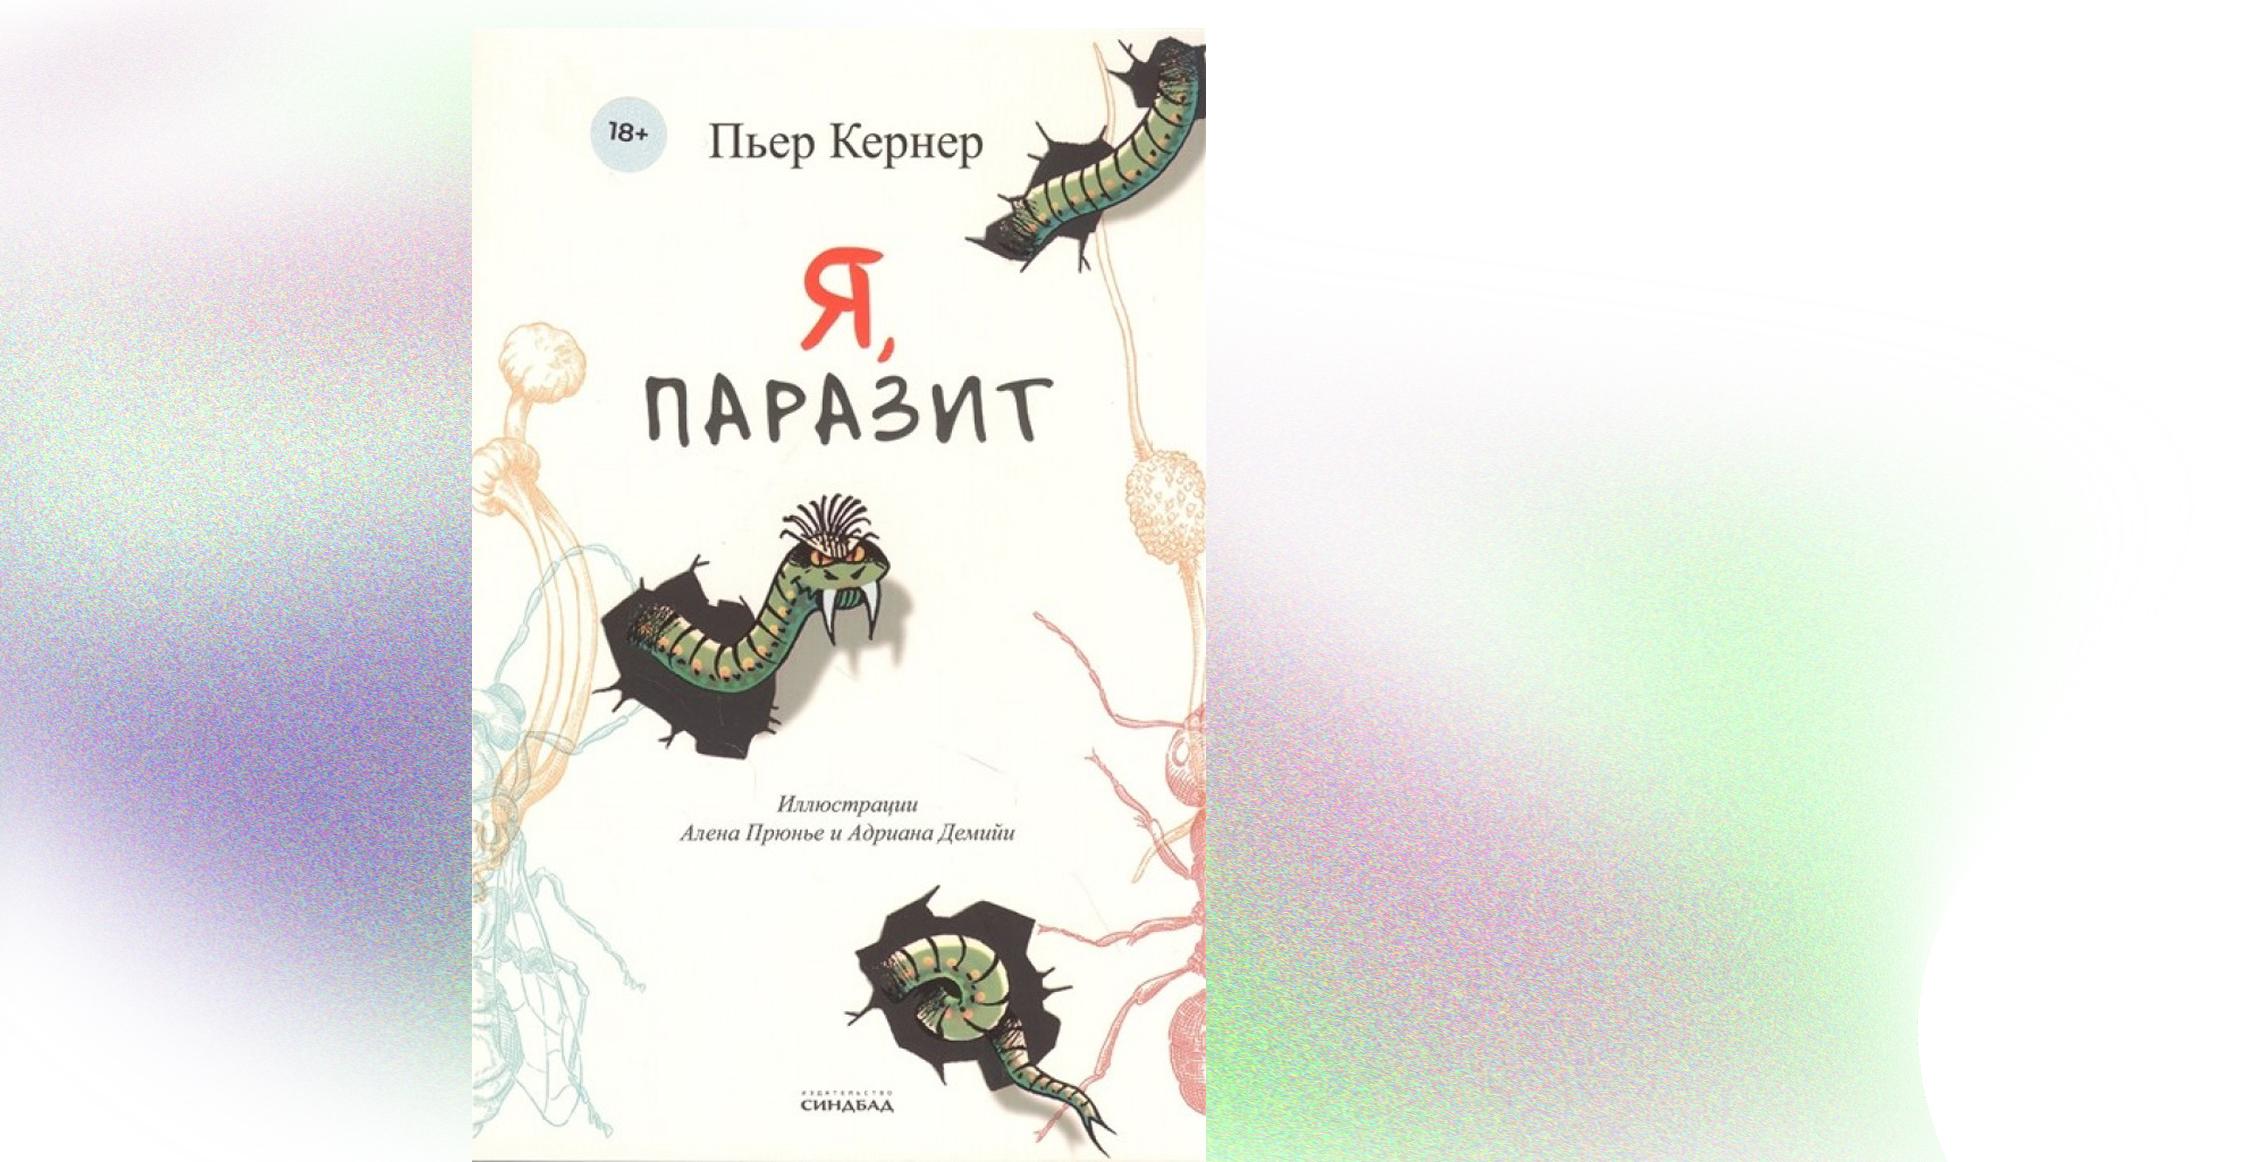 Книга, Я паразит, Пьер Кернер, 978-5-00131-305-2